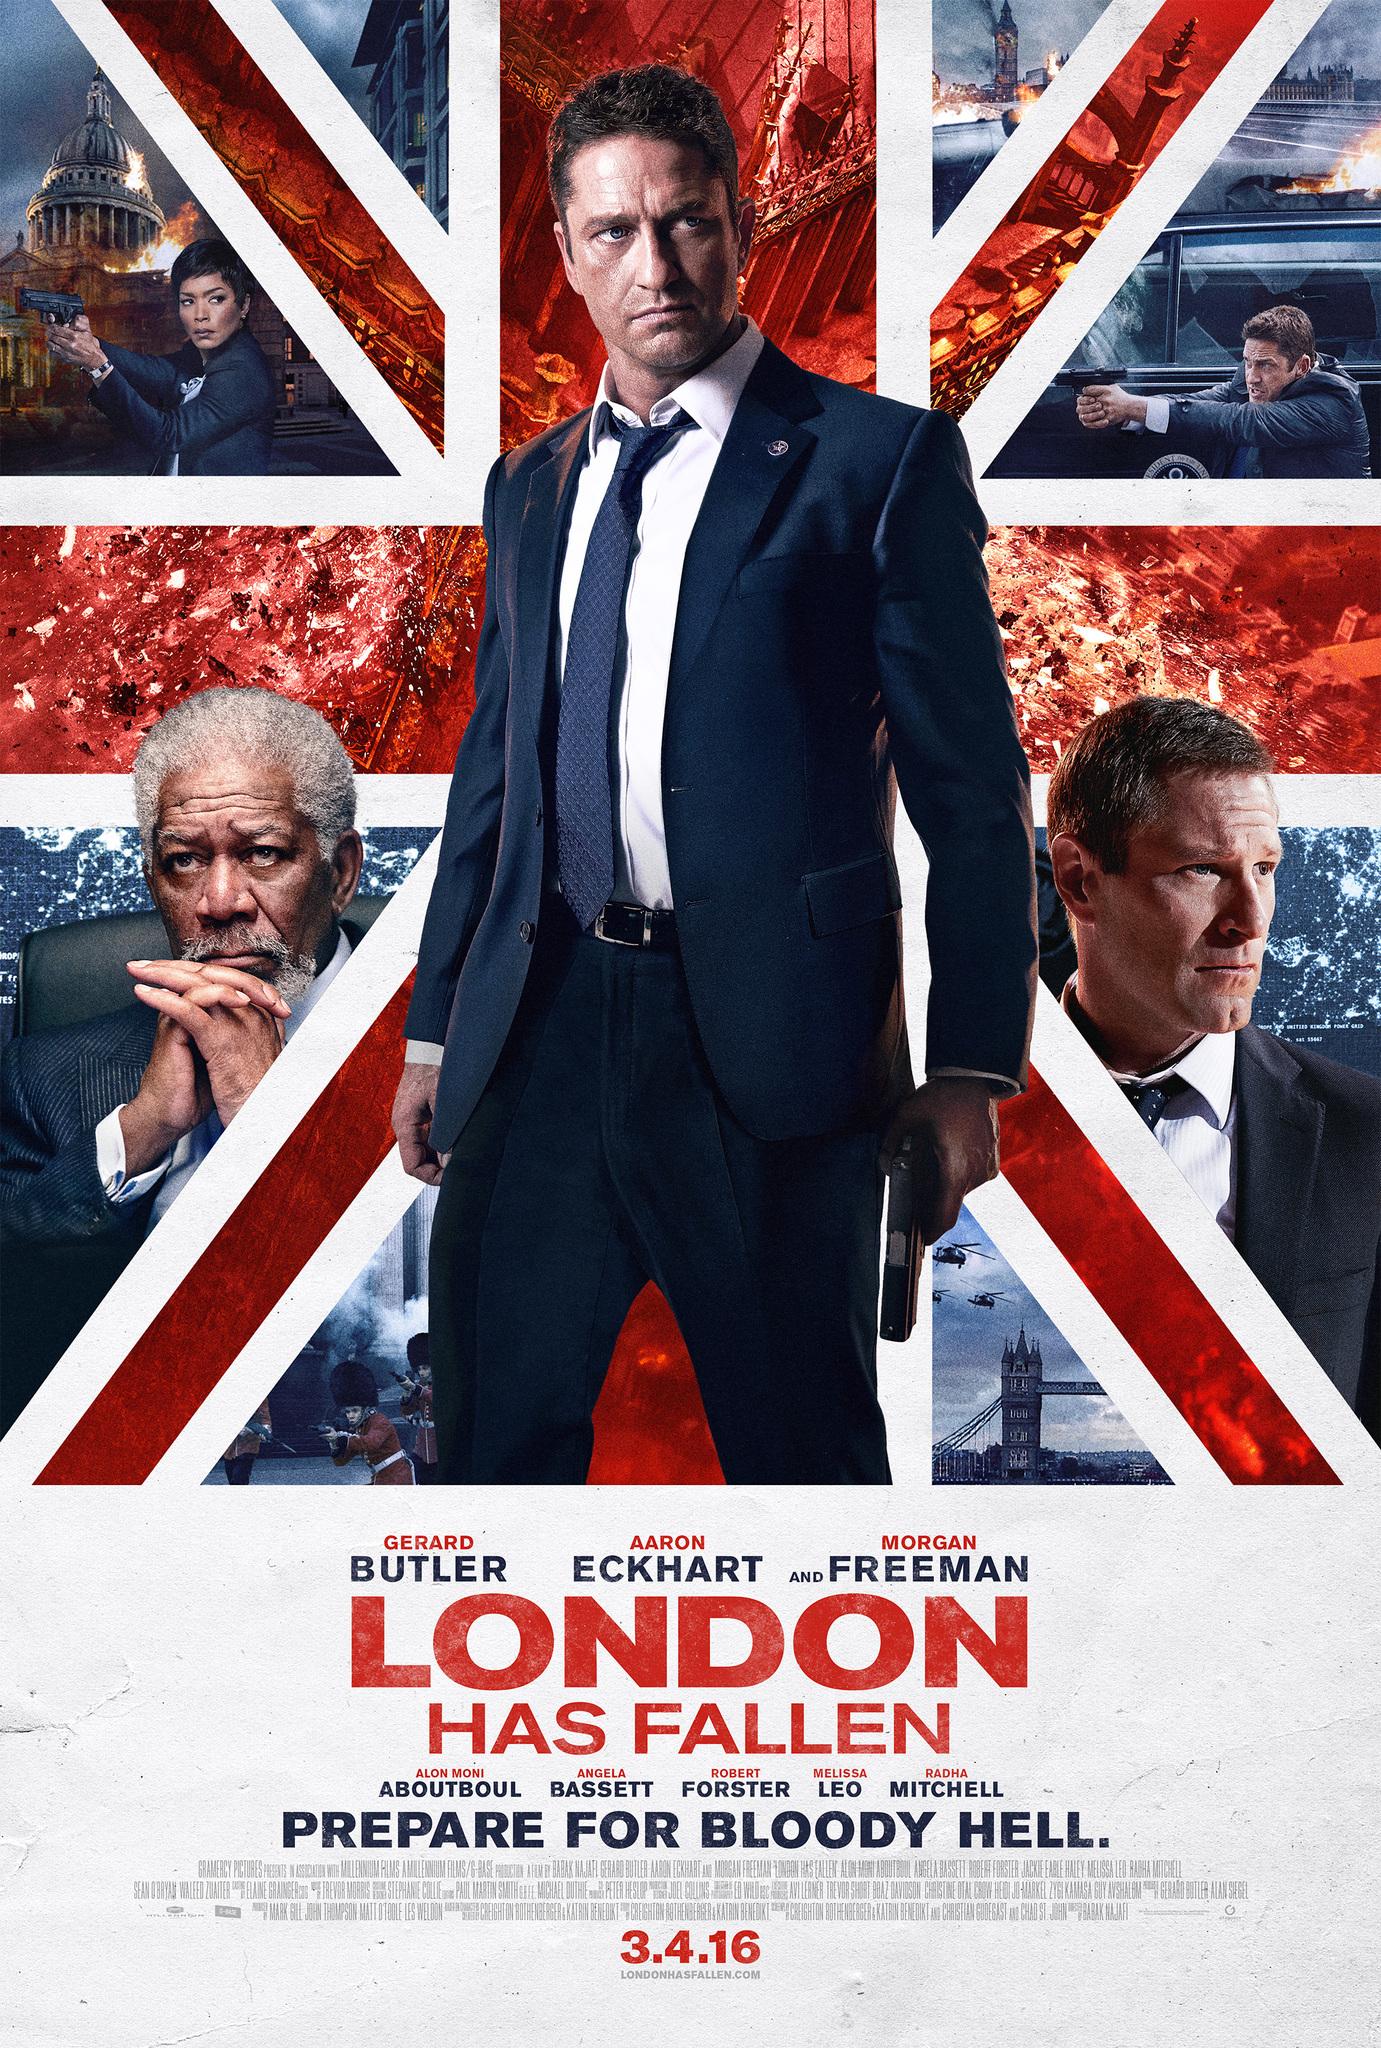 London Has Fallen (2016) Hindi Dubbed 720p HDRip Download